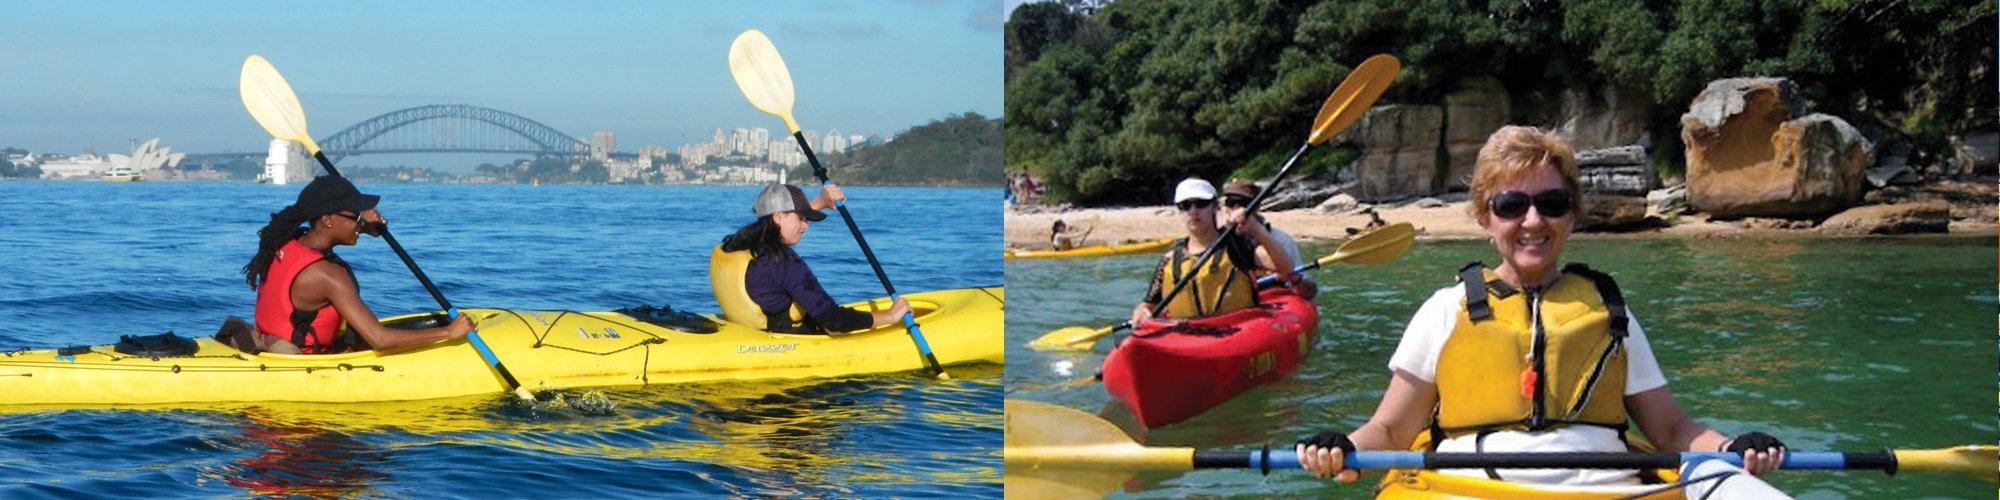 Sydney Harbour Lunch Kayak